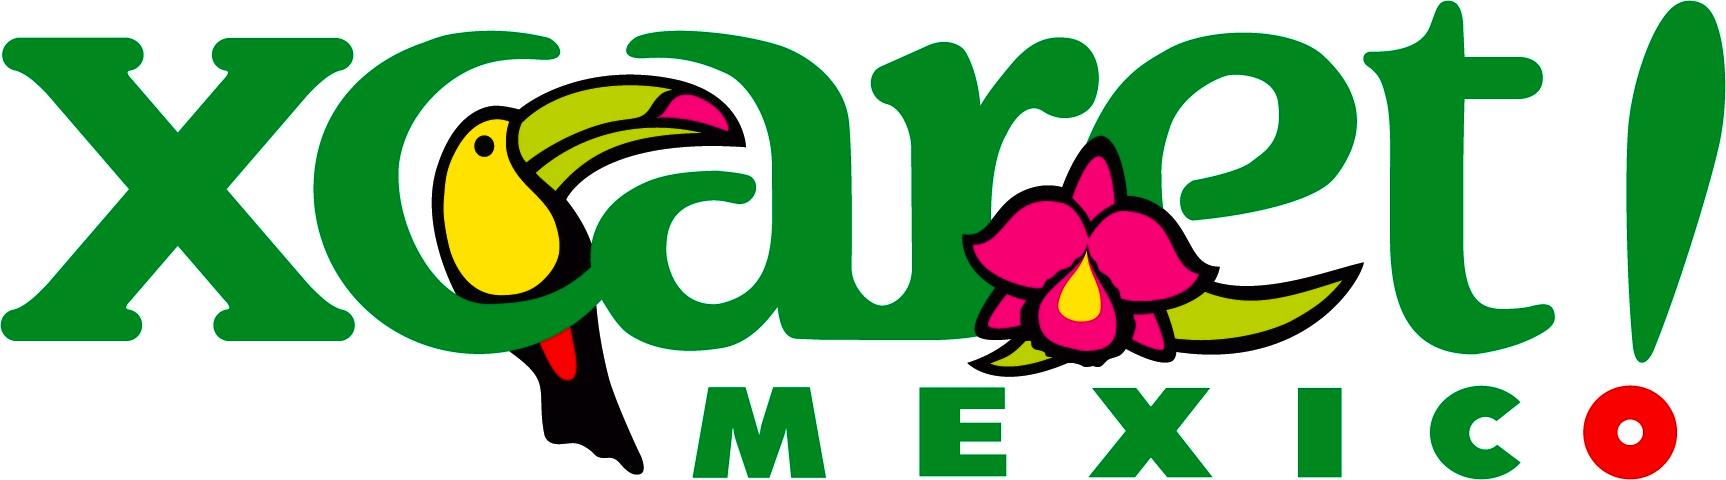 Xcaretmexico riviera maya pinterest. Florida clipart vacation mexican